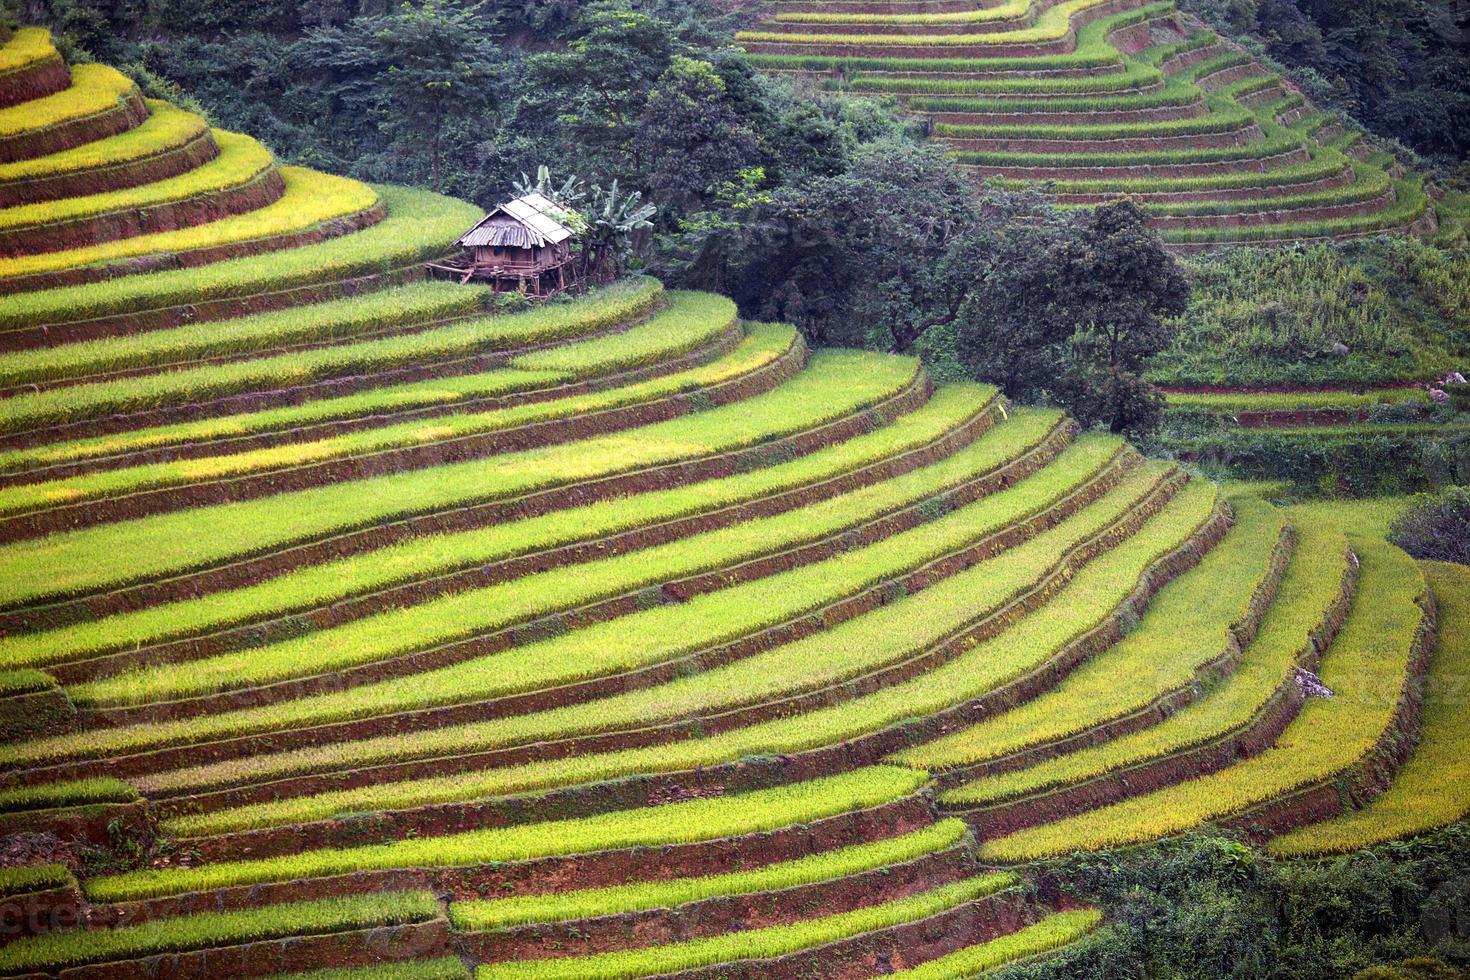 fazenda de arroz no Vietnã foto